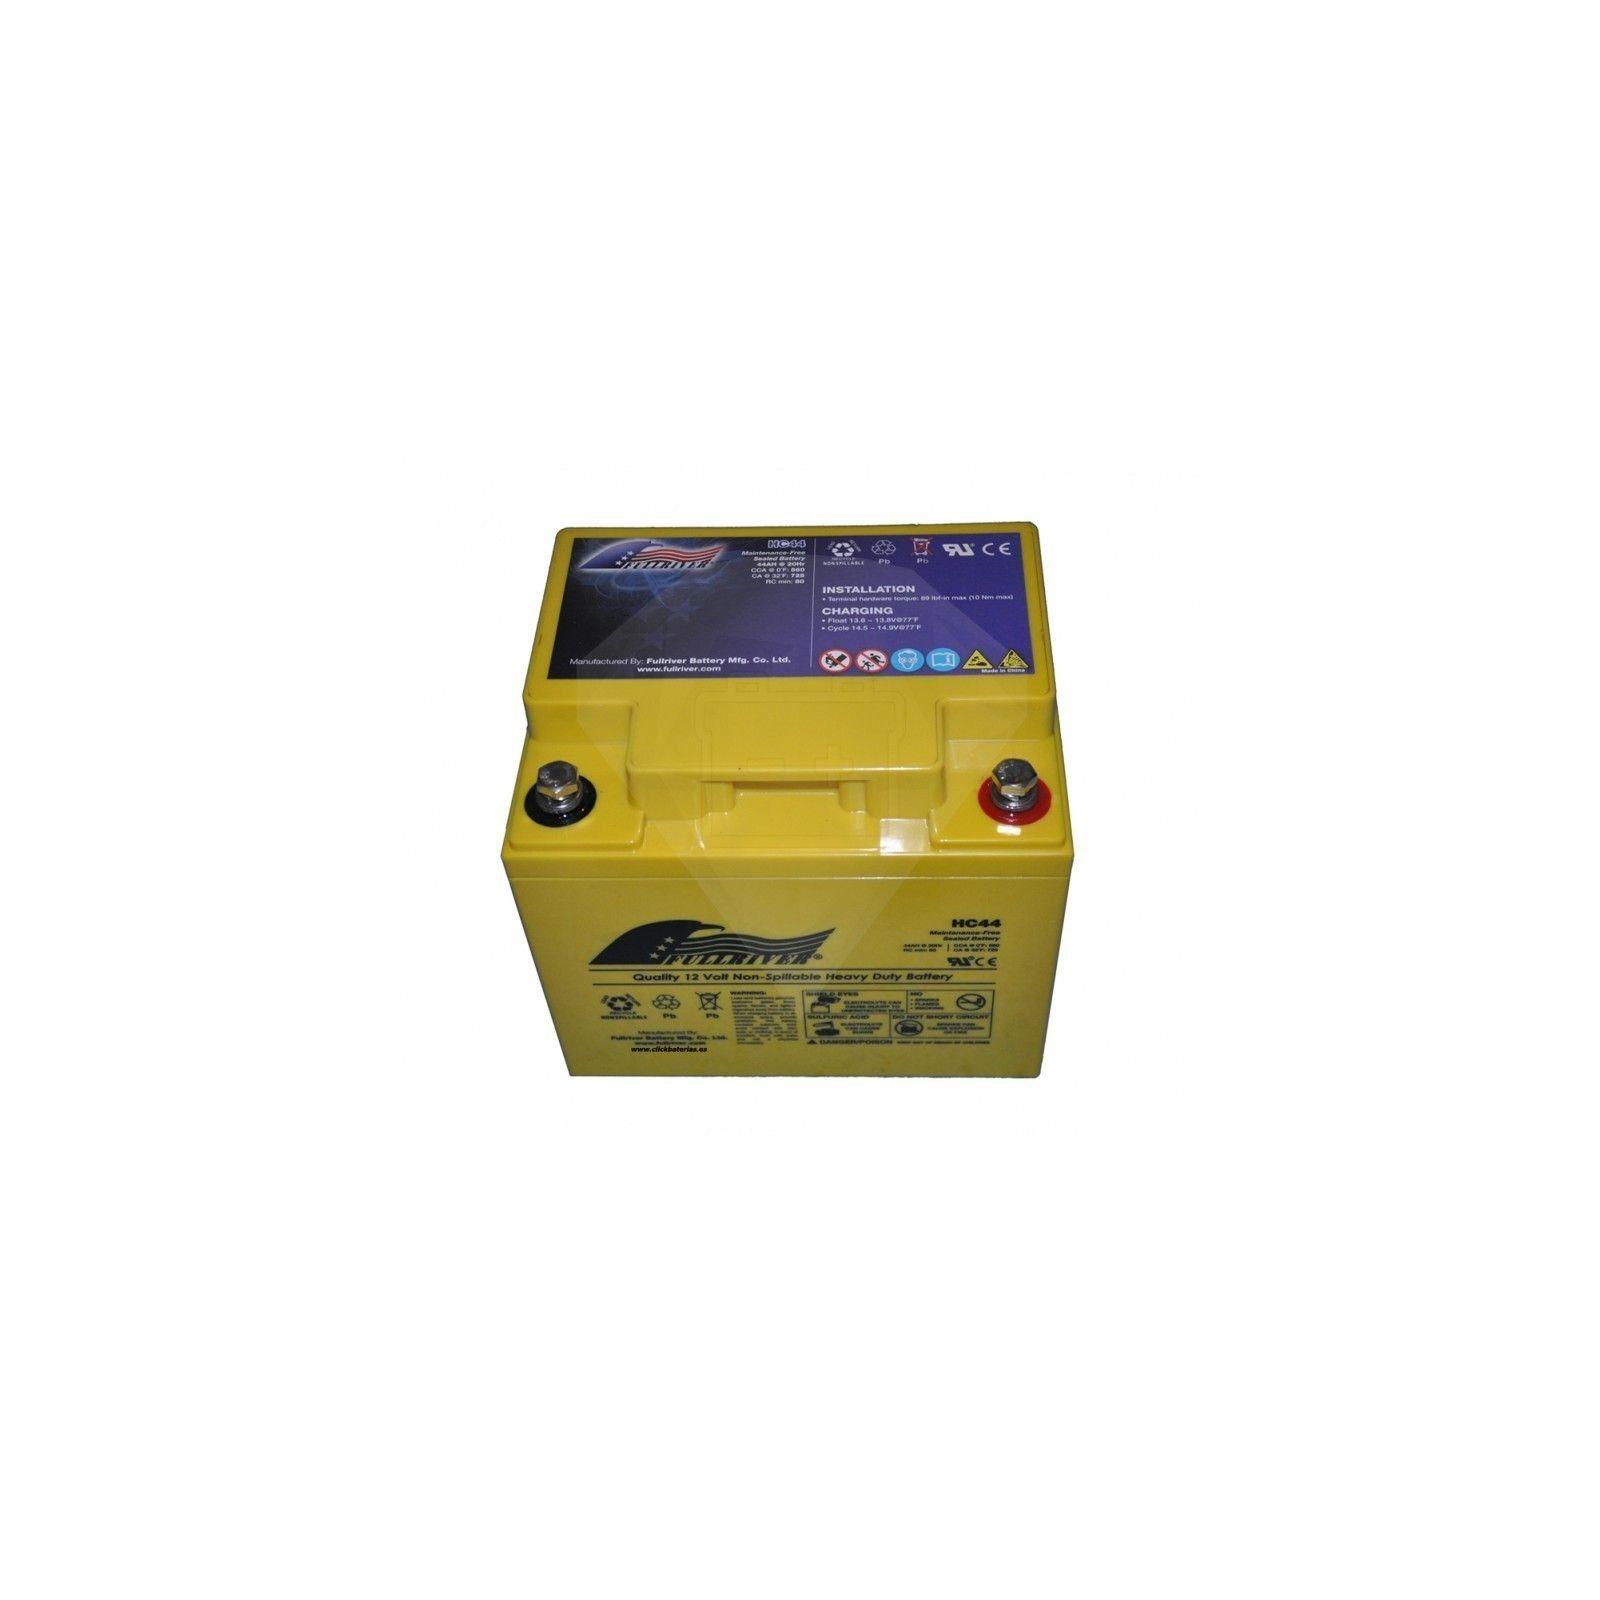 BATERIA Fullriver FULLRIVER HC44 44Ah 560A 12V FULLRIVER - 1